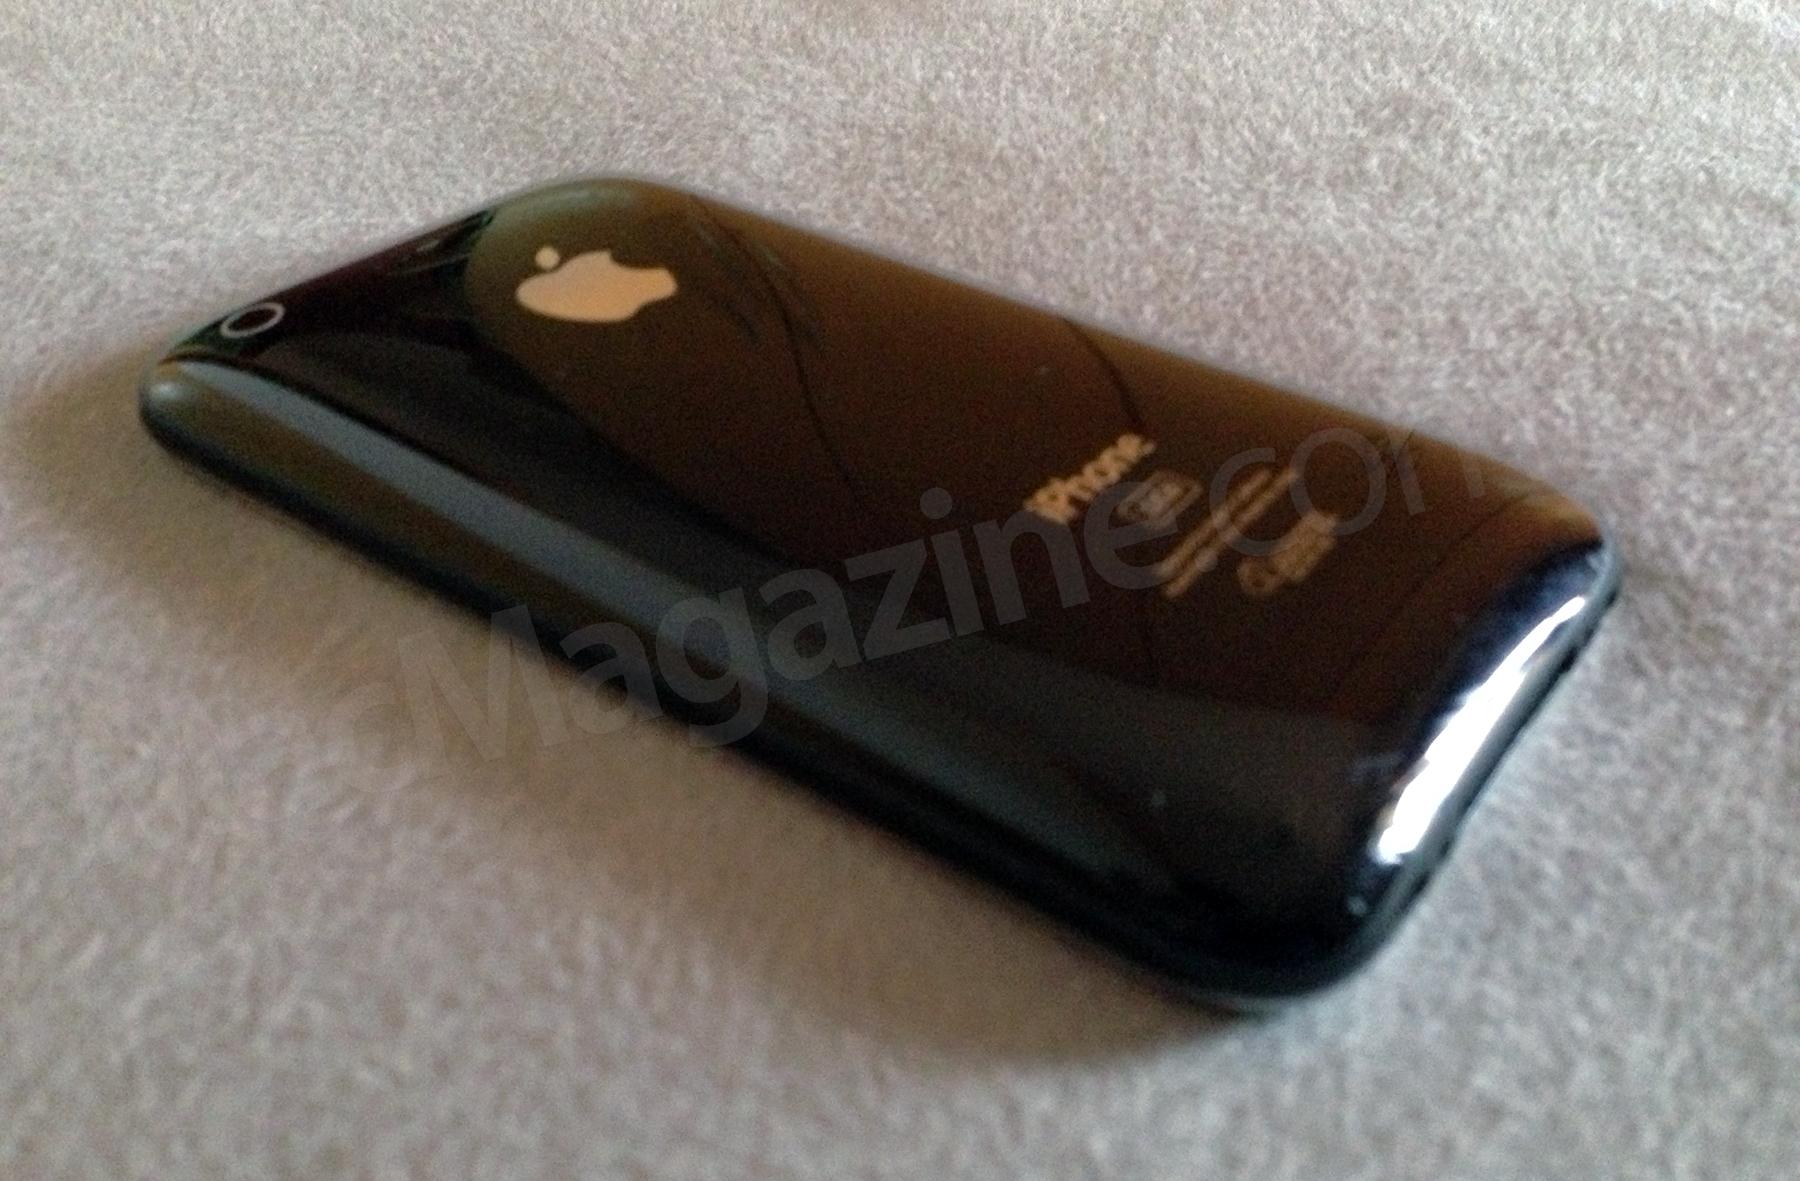 iPhone 3GS do Wilsians